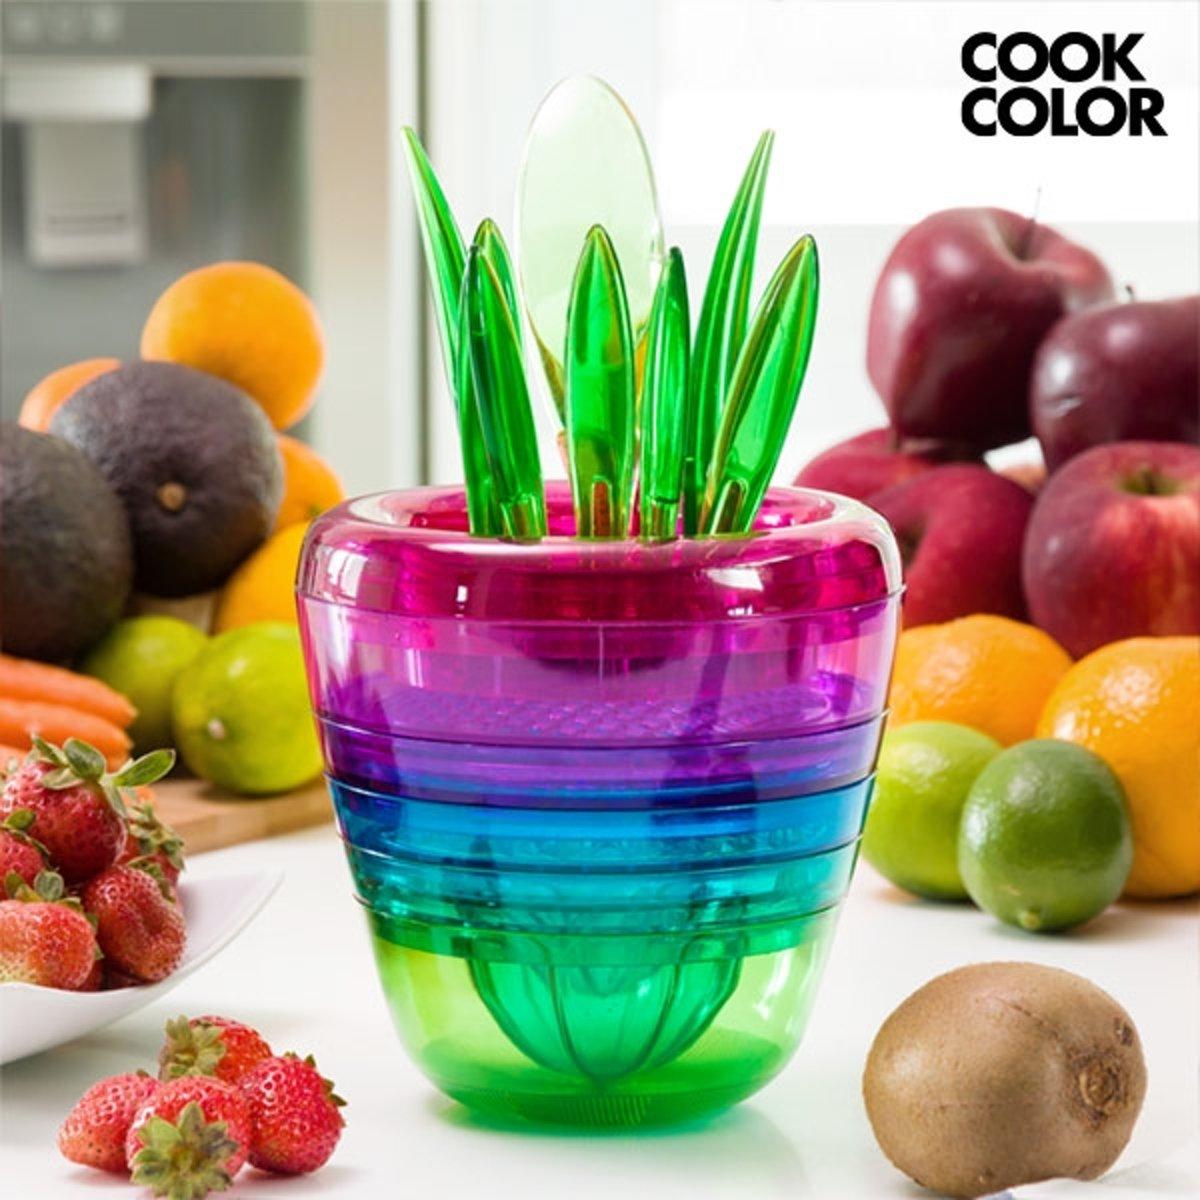 Multi Tool Fruit Cook Color Stapelbaar Keukengerei kopen